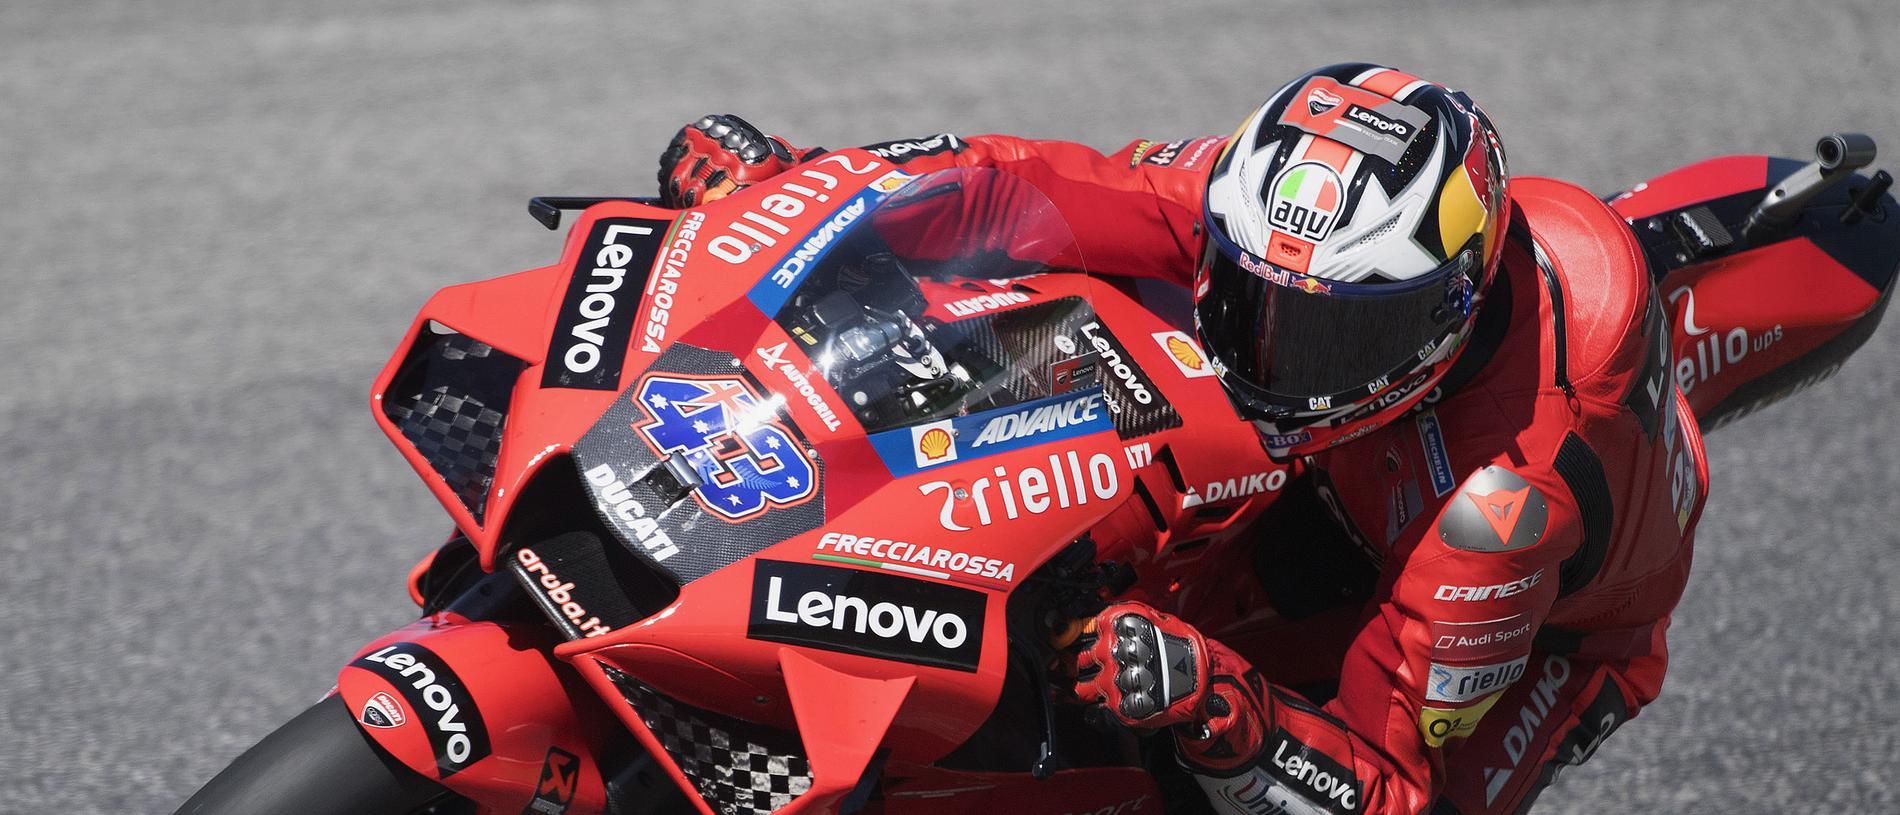 Motogp 2021 Italian Grand Prix At Mugello Practice Times Jack Miller Off Pace As Francesco Bagnaia Tops Session